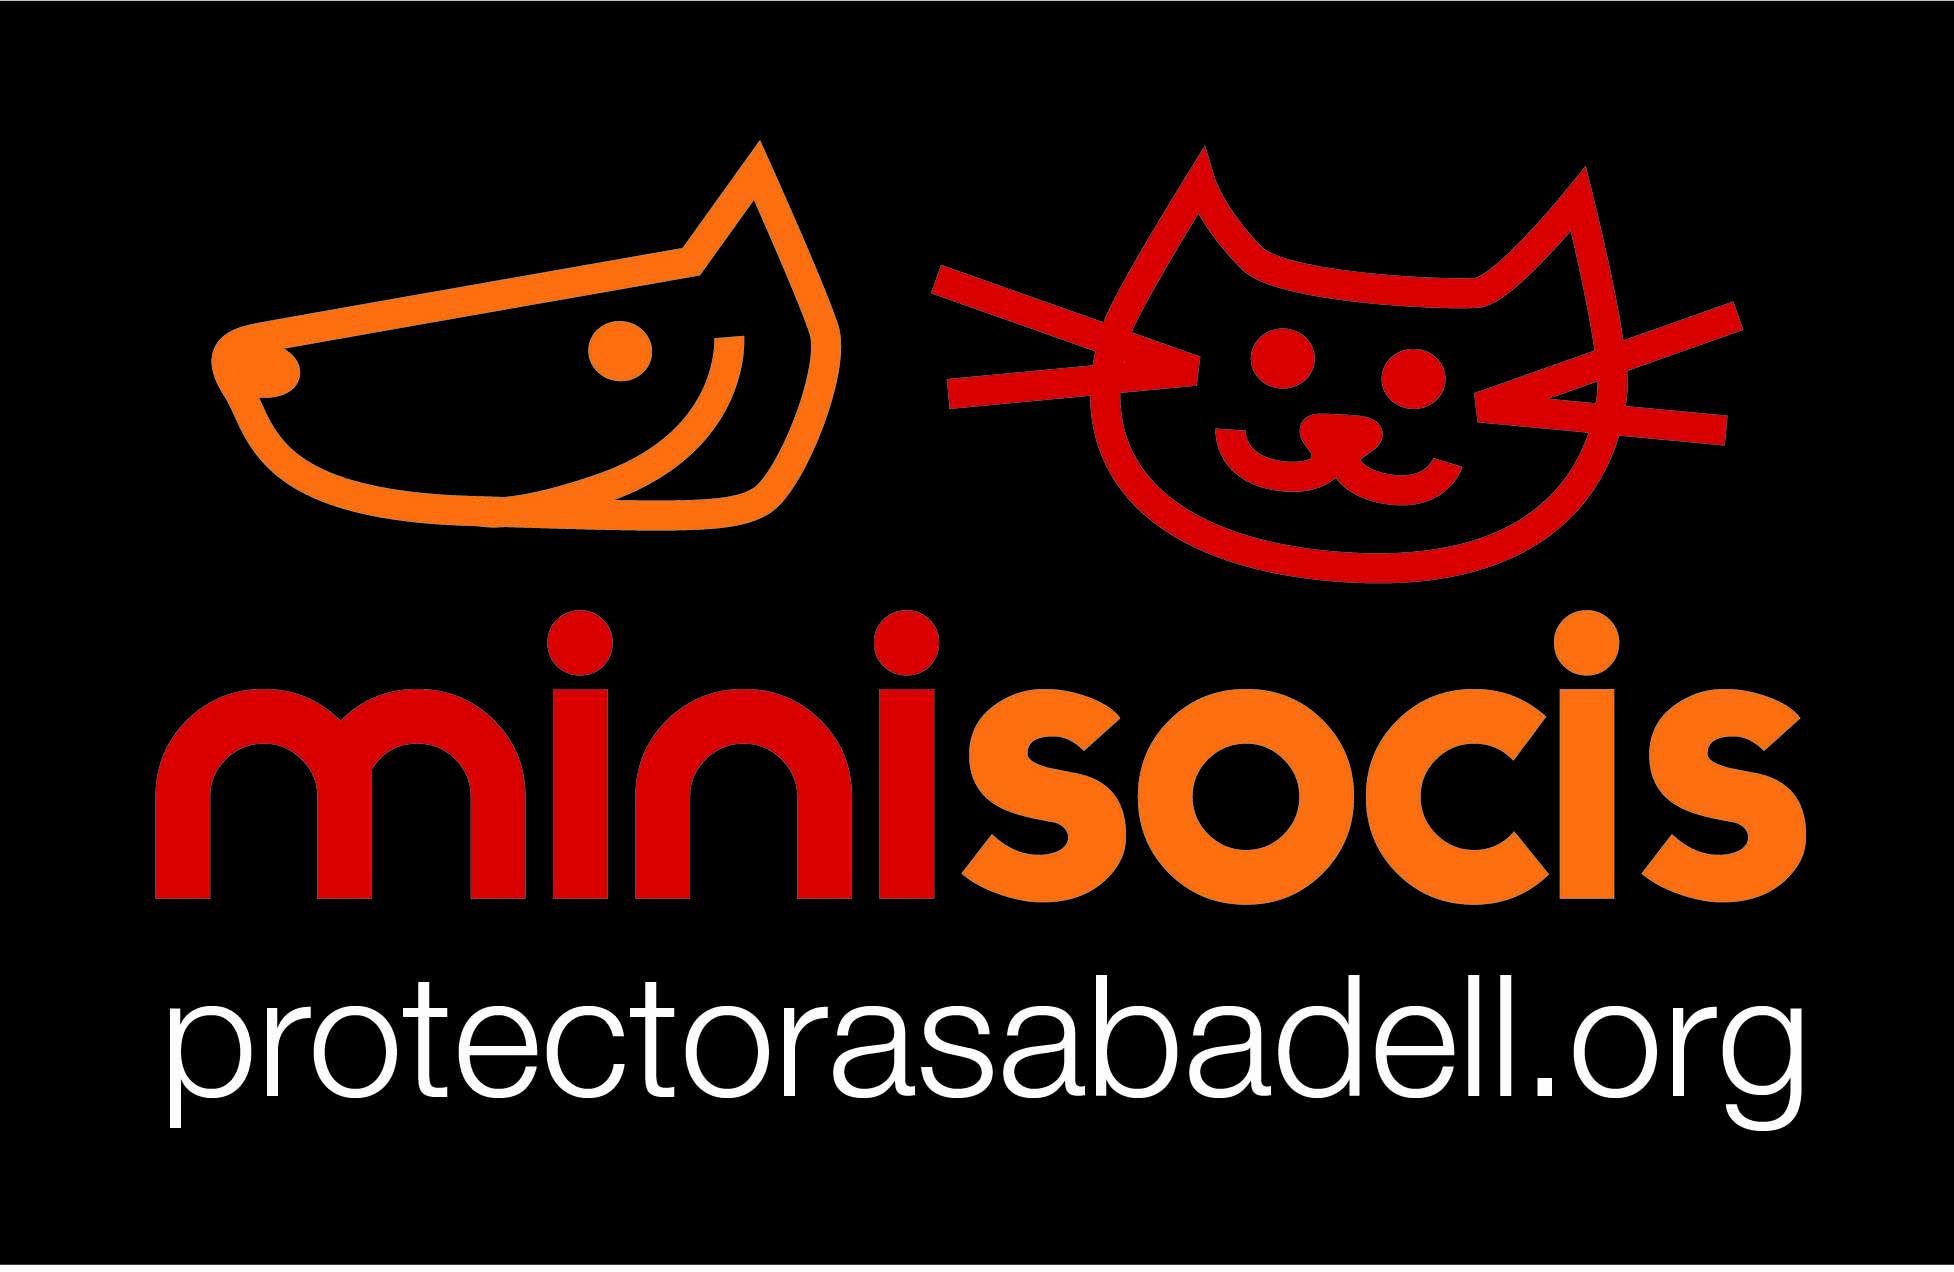 logo minisocis